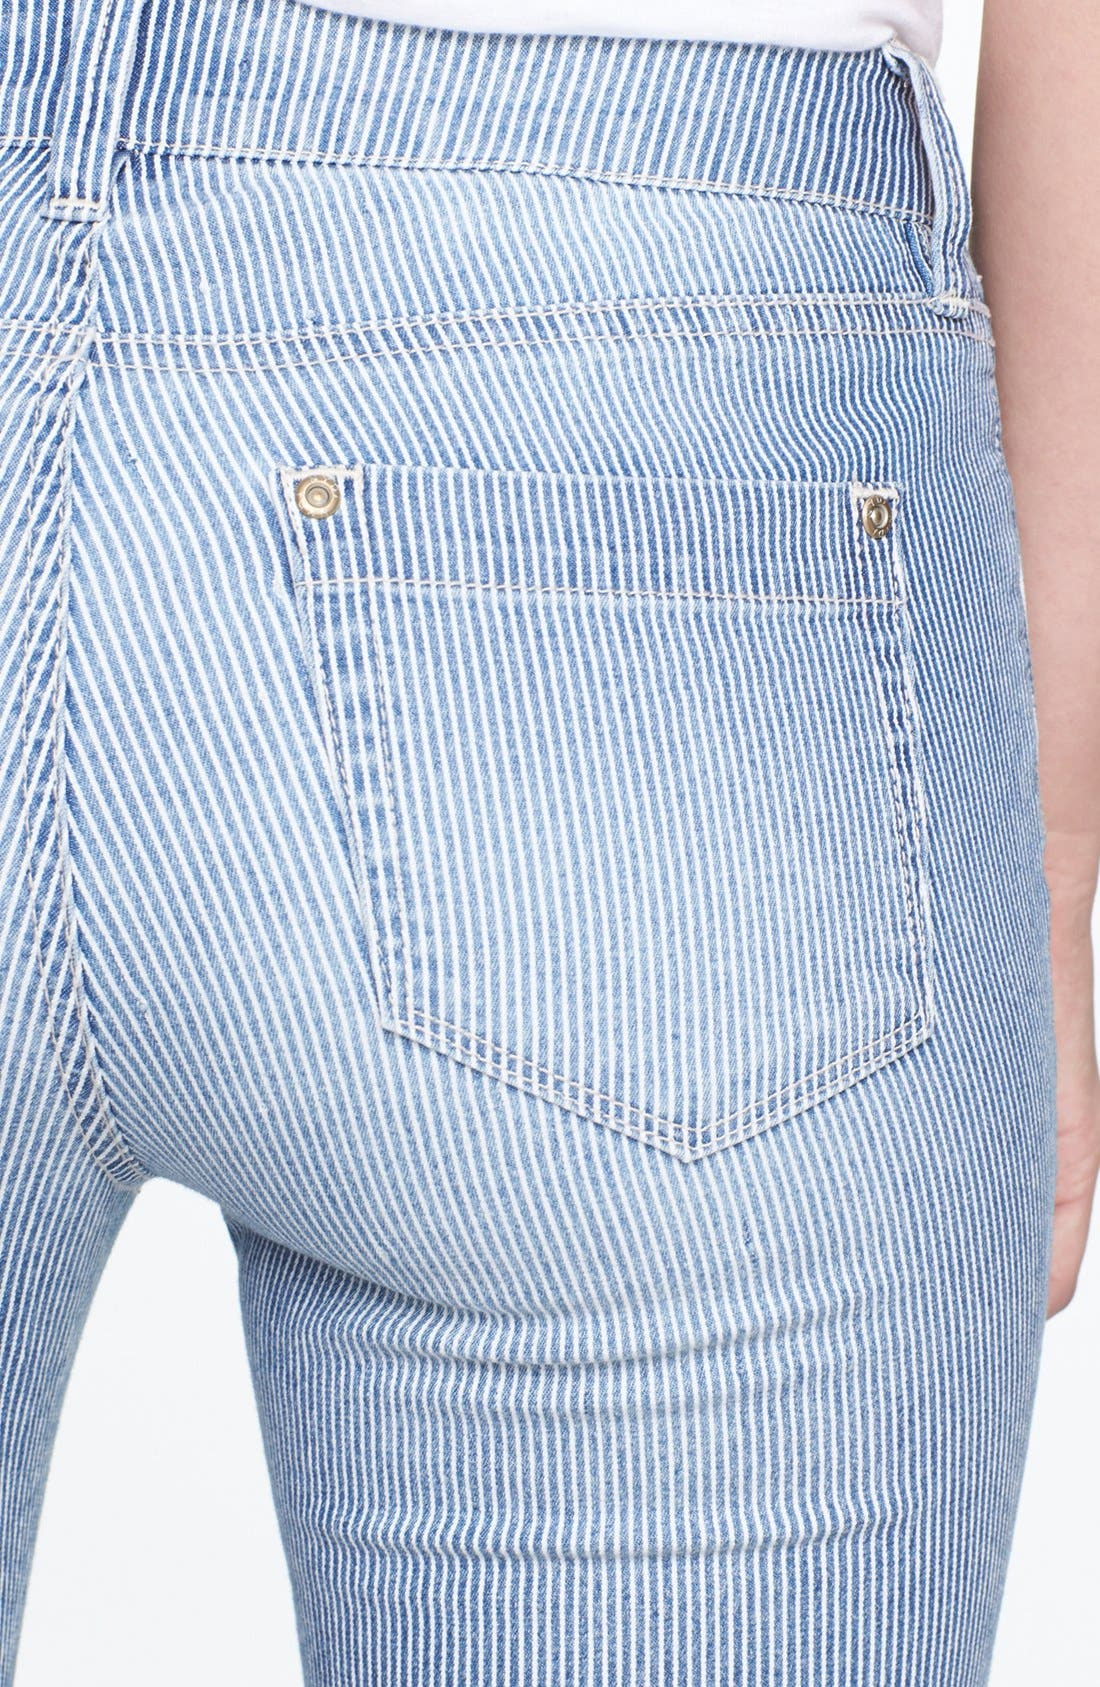 Alternate Image 3  - NYDJ 'Leann' Stretch Skinny Boyfriend Jeans (Old West Stripe) (Petite)